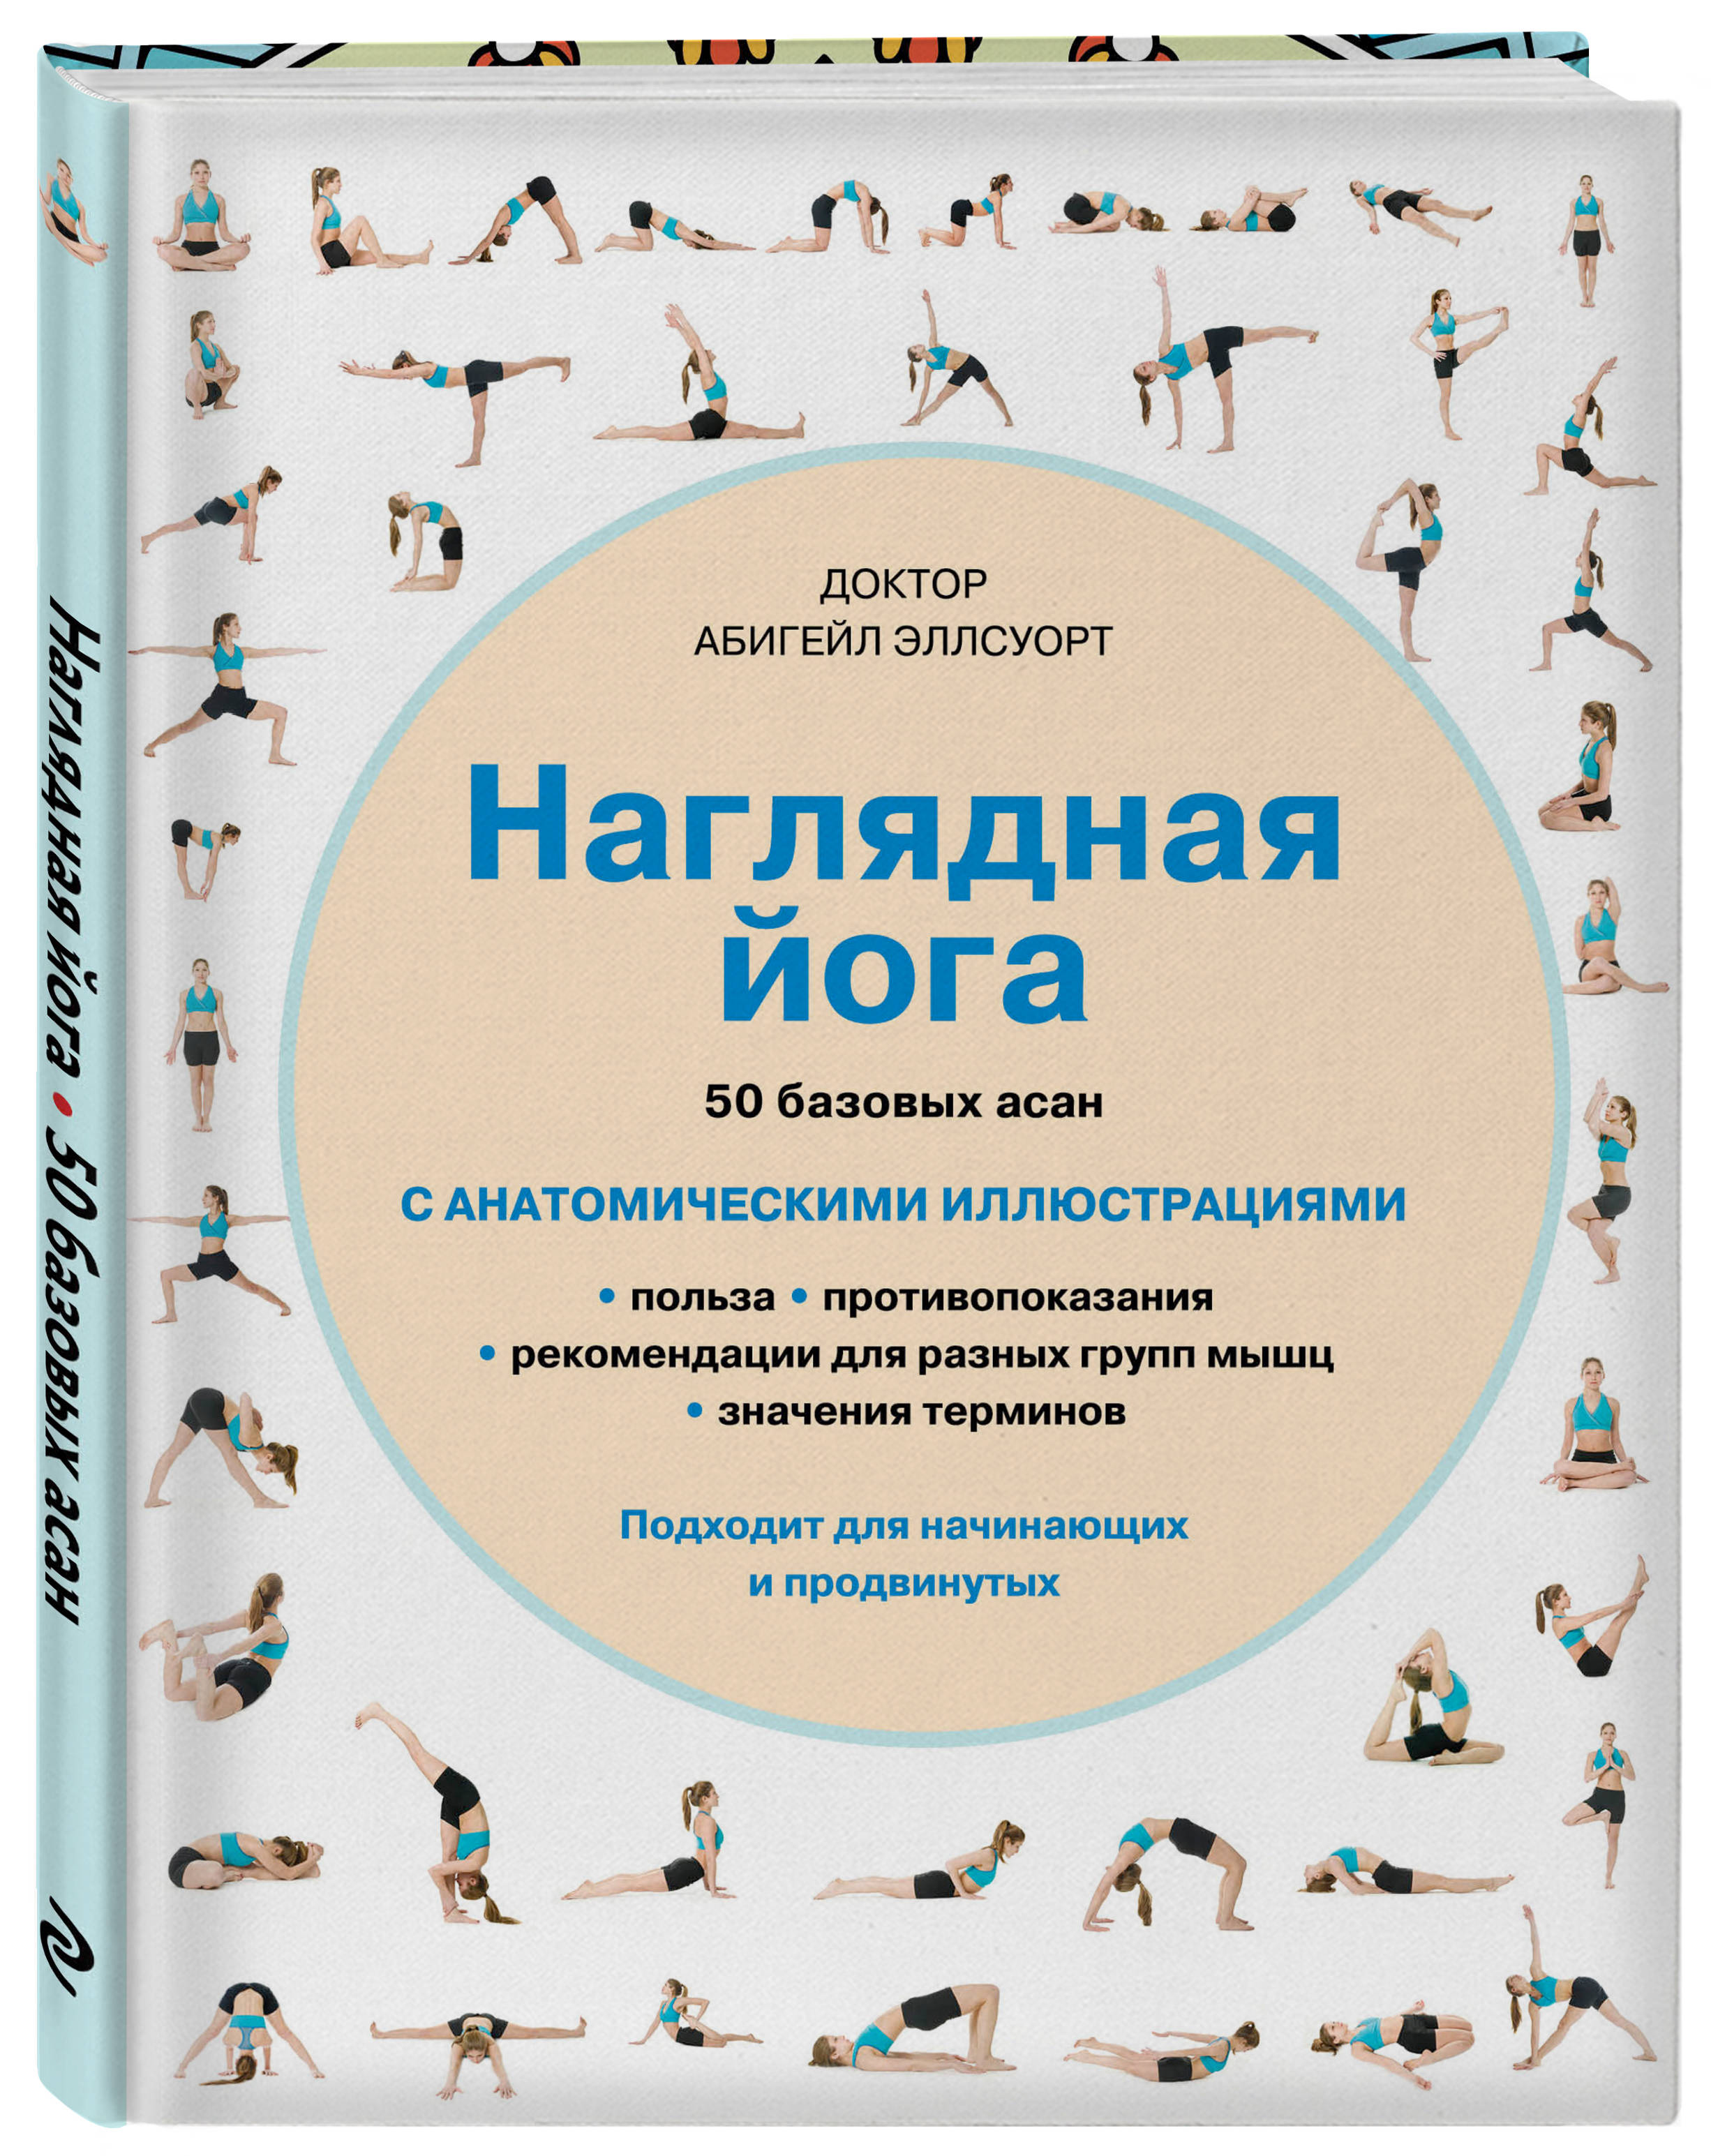 Наглядная йога. 50 базовых асан ( Эллсуорт А.  )